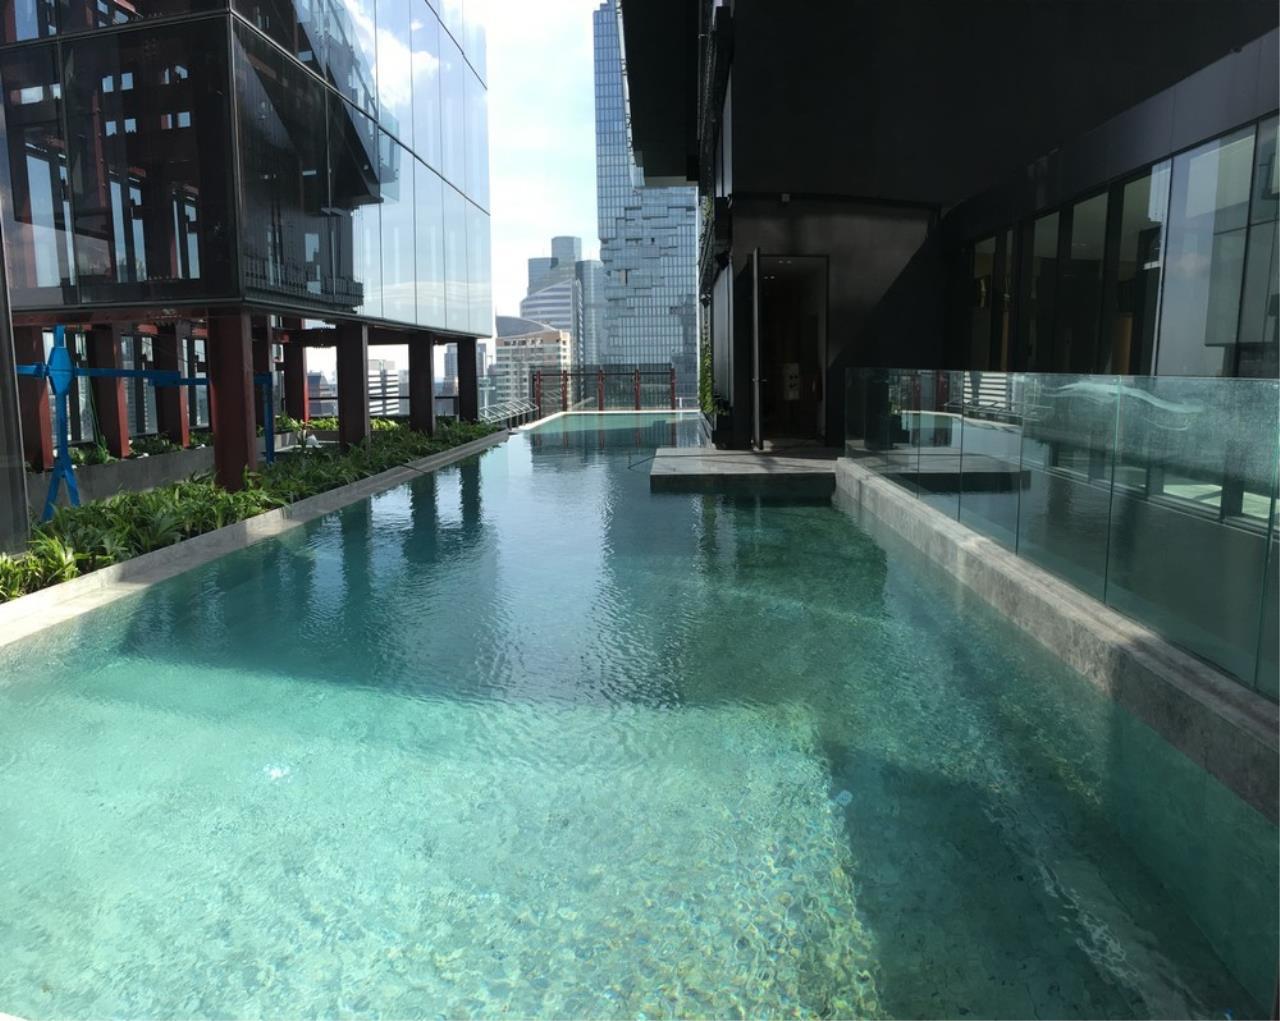 Agent - Chonticha Agency's Condo for sales ASHTON SILOM Corner Room 75.5 sqm 2 bed Chao Phaya River View 5